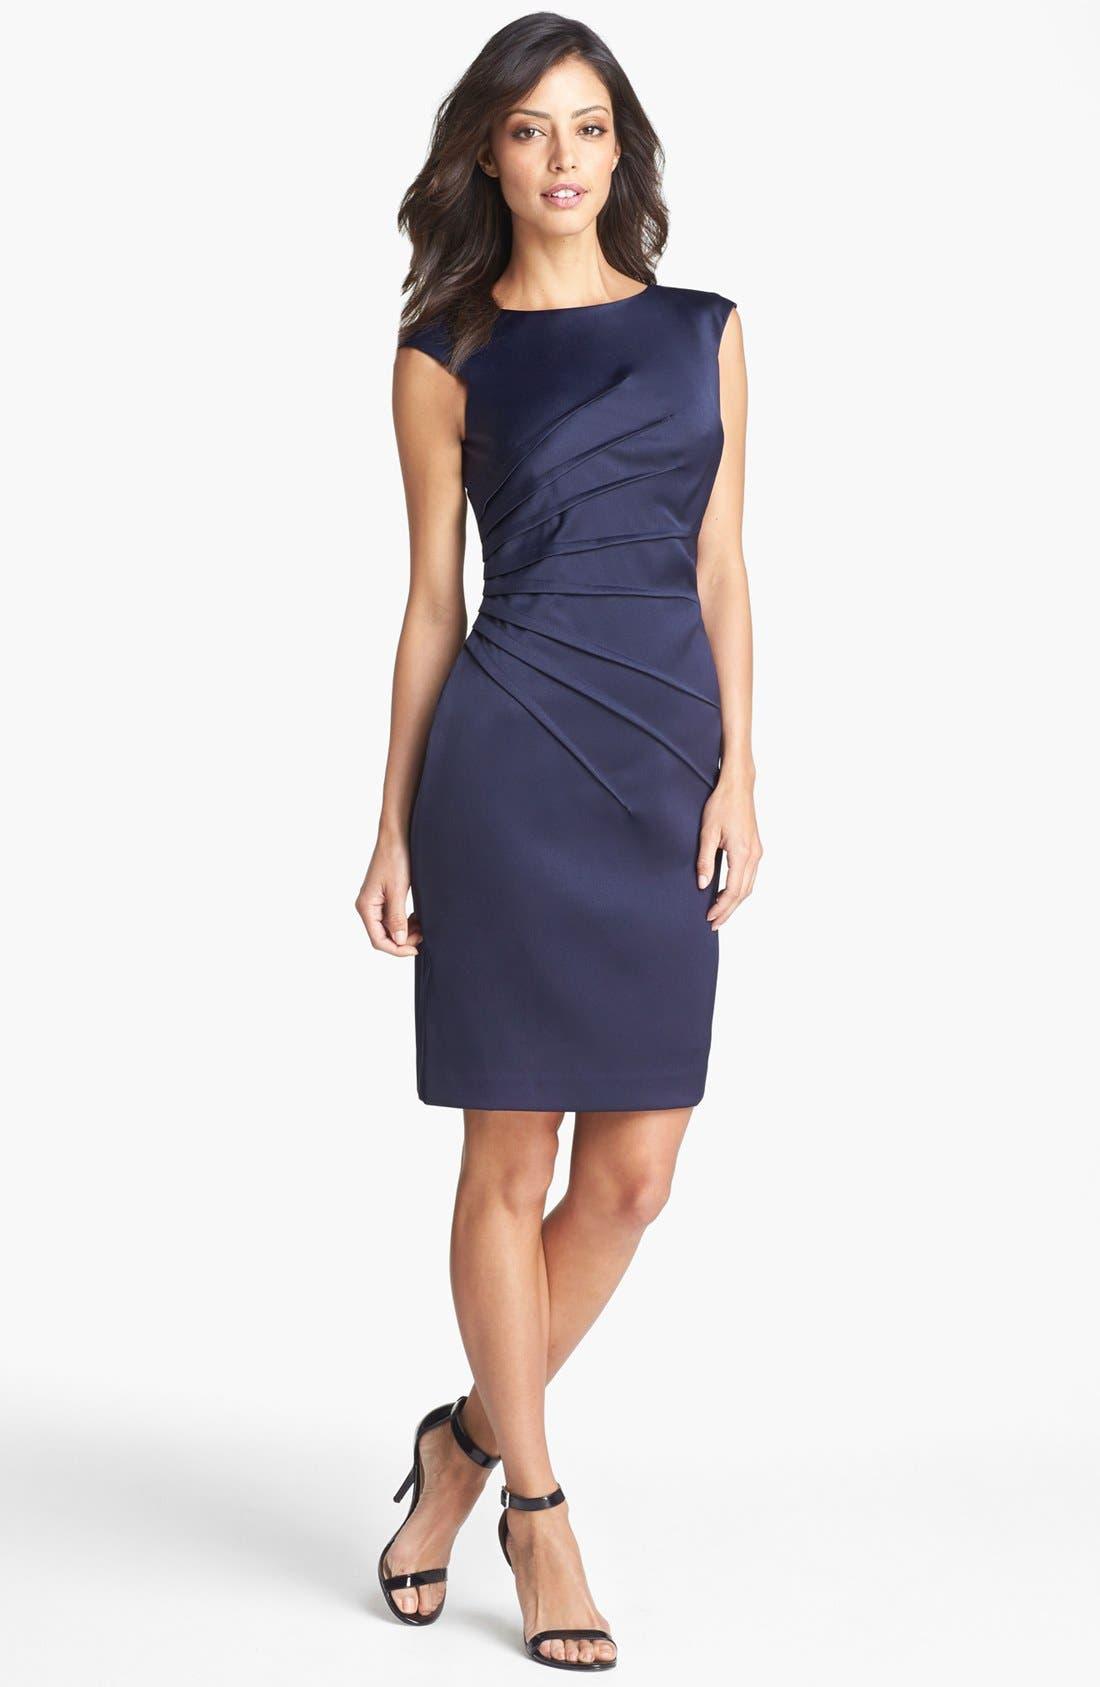 Alternate Image 1 Selected - Eliza J Side Pleat Sheath Dress (Petite)